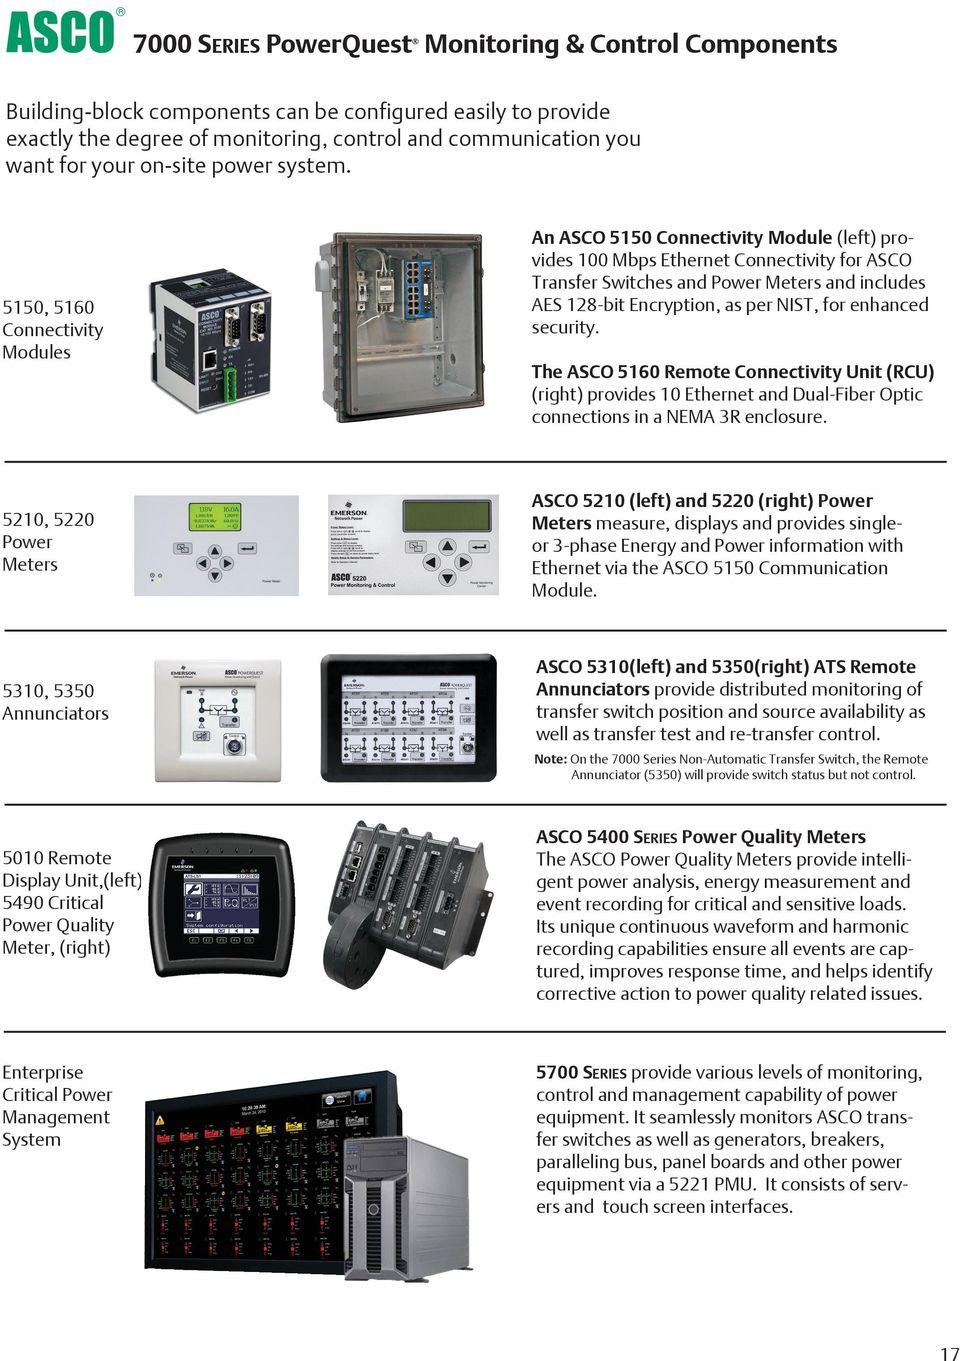 Amazing Asco 7000 Series Power Transfer Switches Pdf Wiring Cloud Ymoonsalvmohammedshrineorg